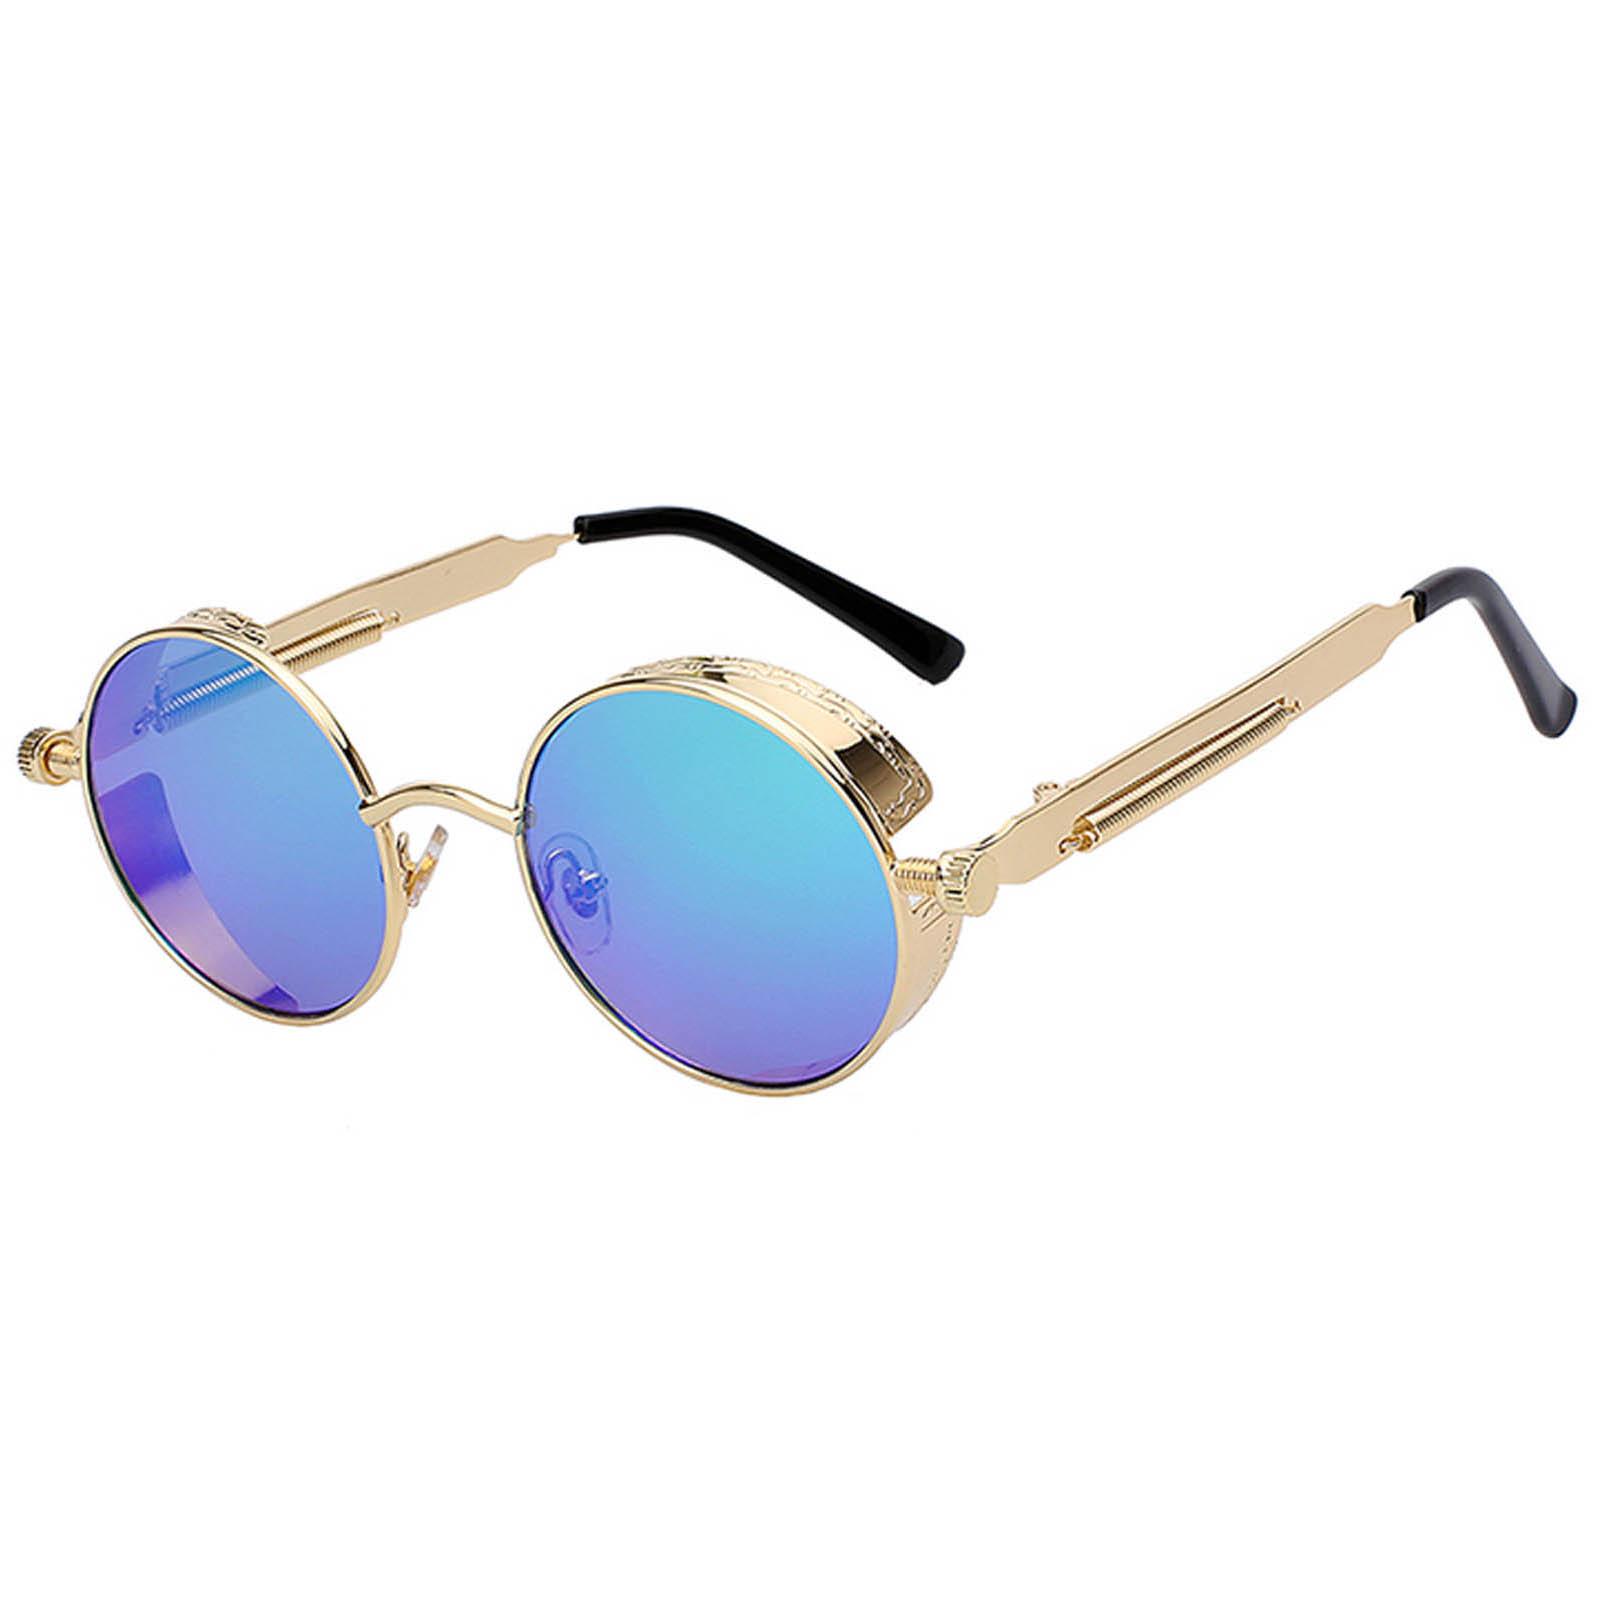 OWL ® Steampunk Gothic Eyewear Sunglasses Women's Men's Metal Round Circle Gold Frame Pink Mirror Lens One Pair